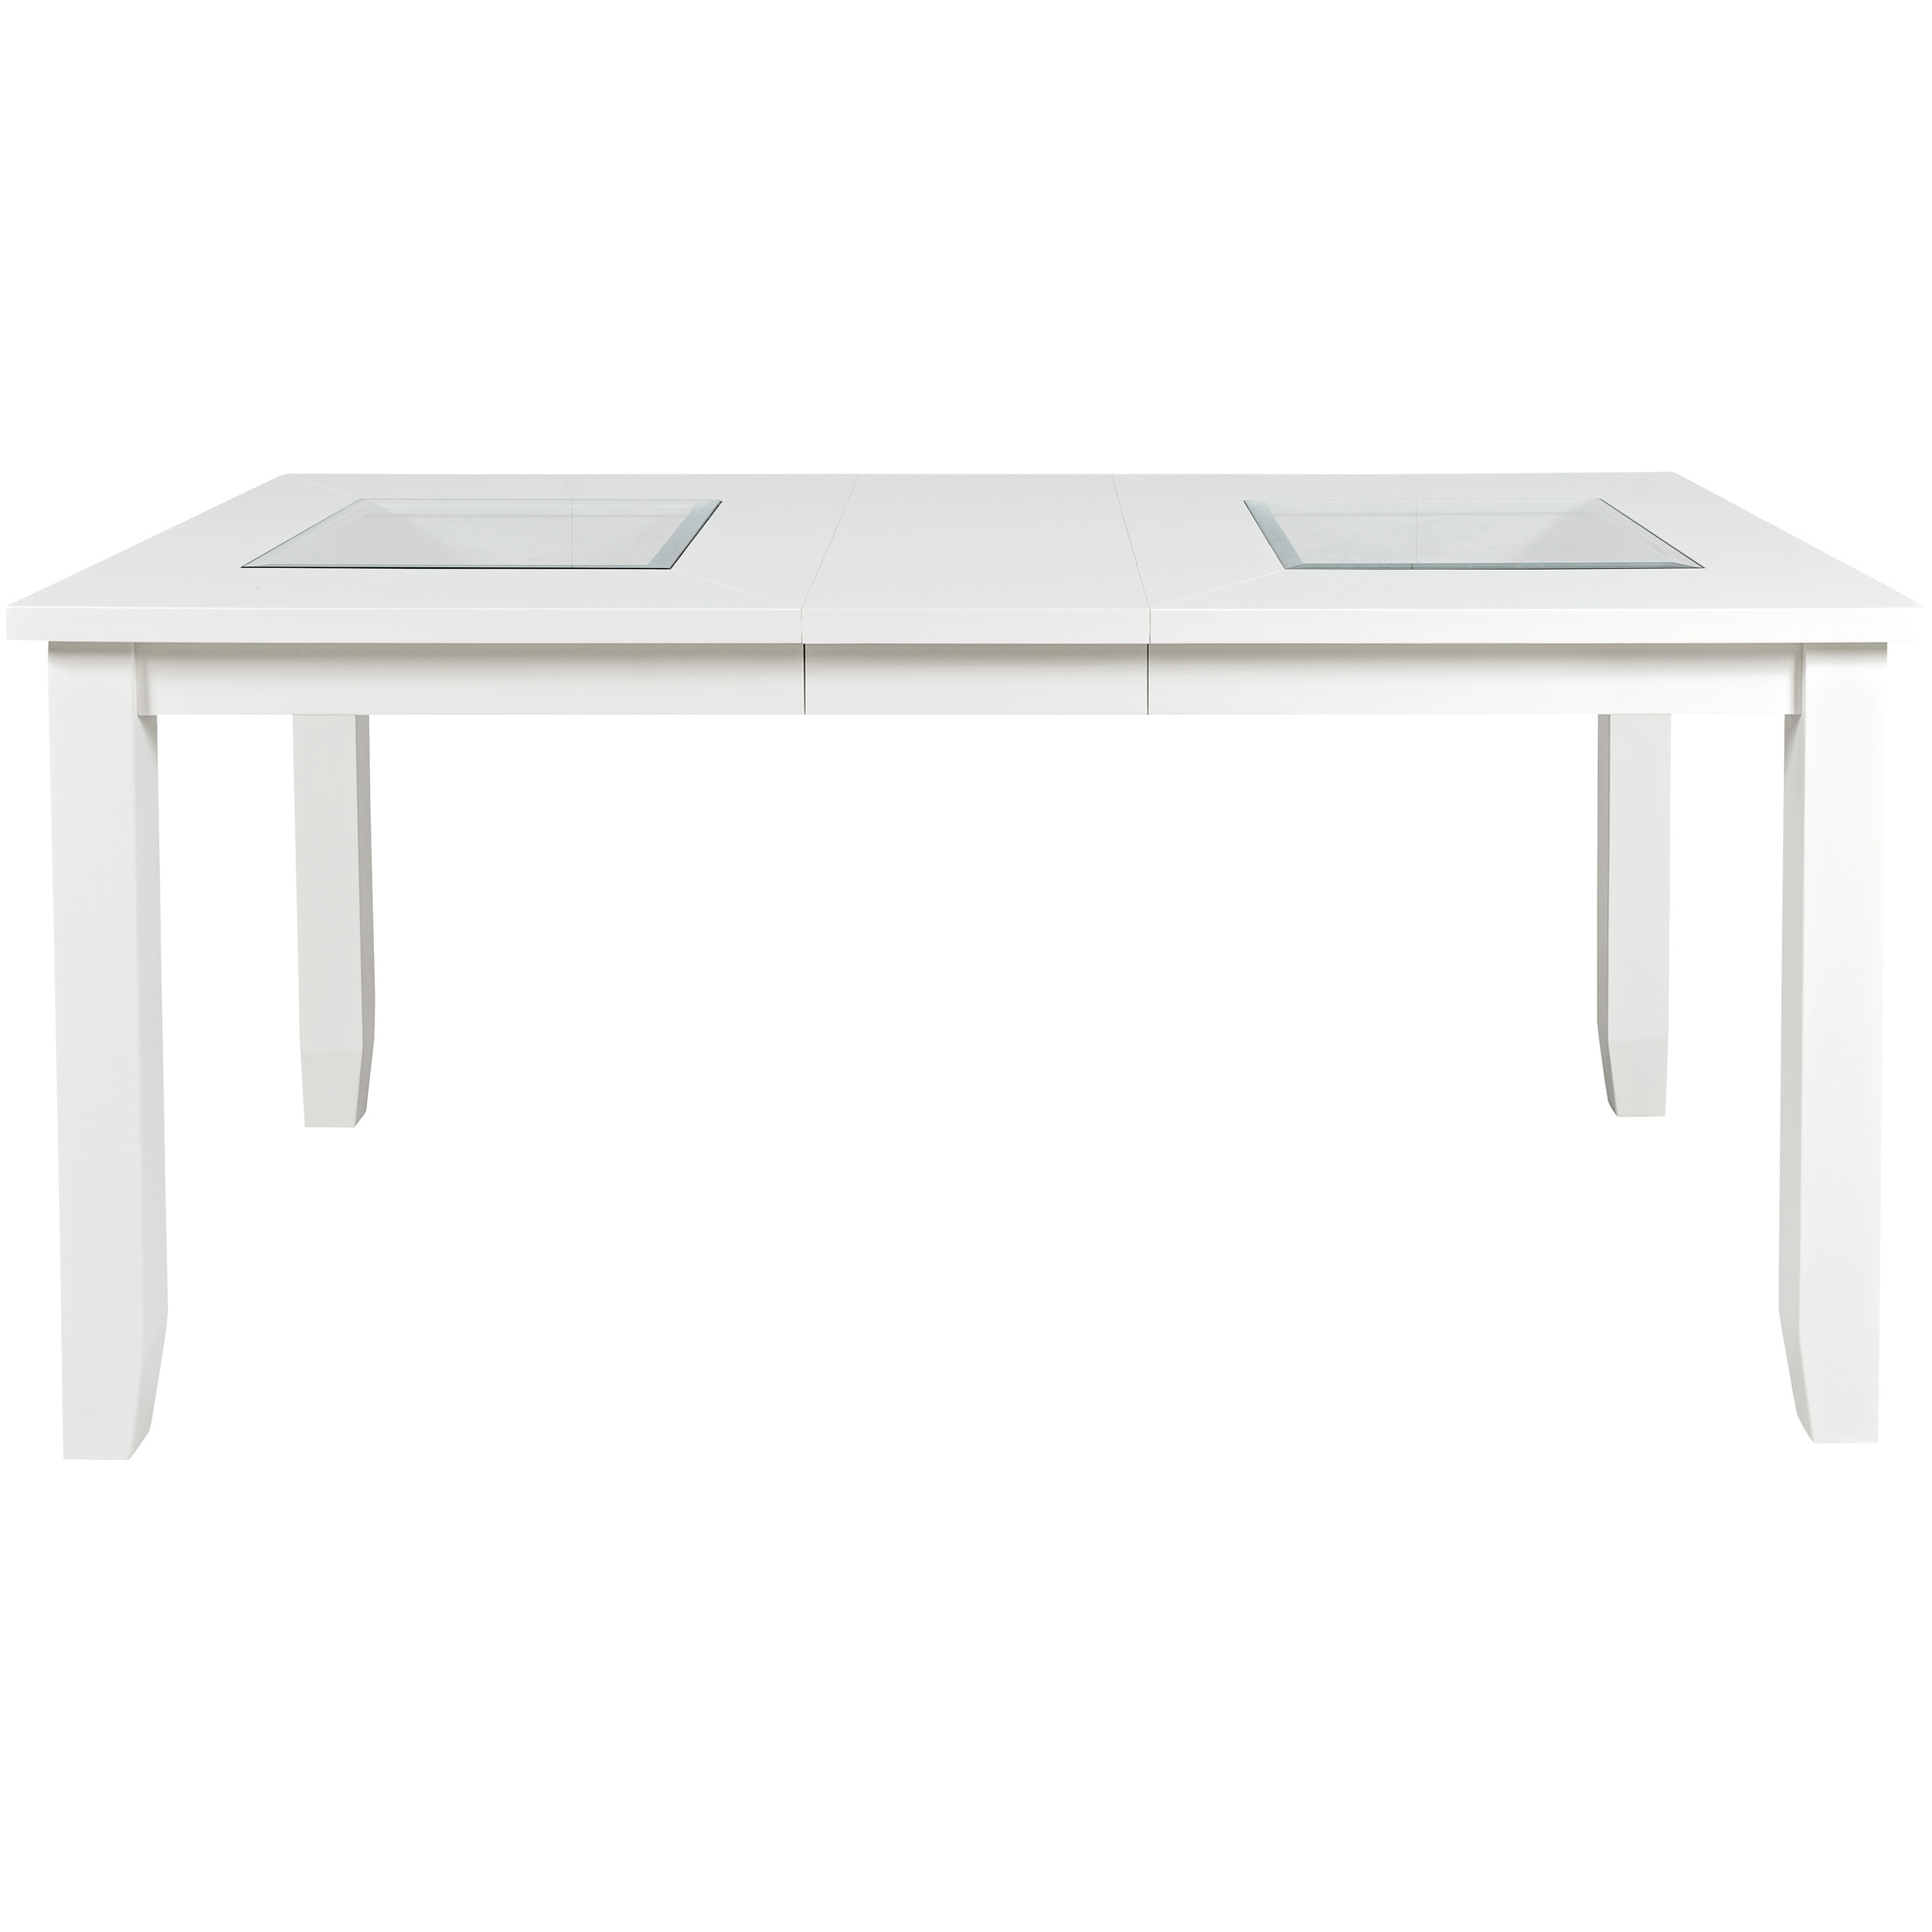 Jofran, Inc. | Urban Icon White Dining Table